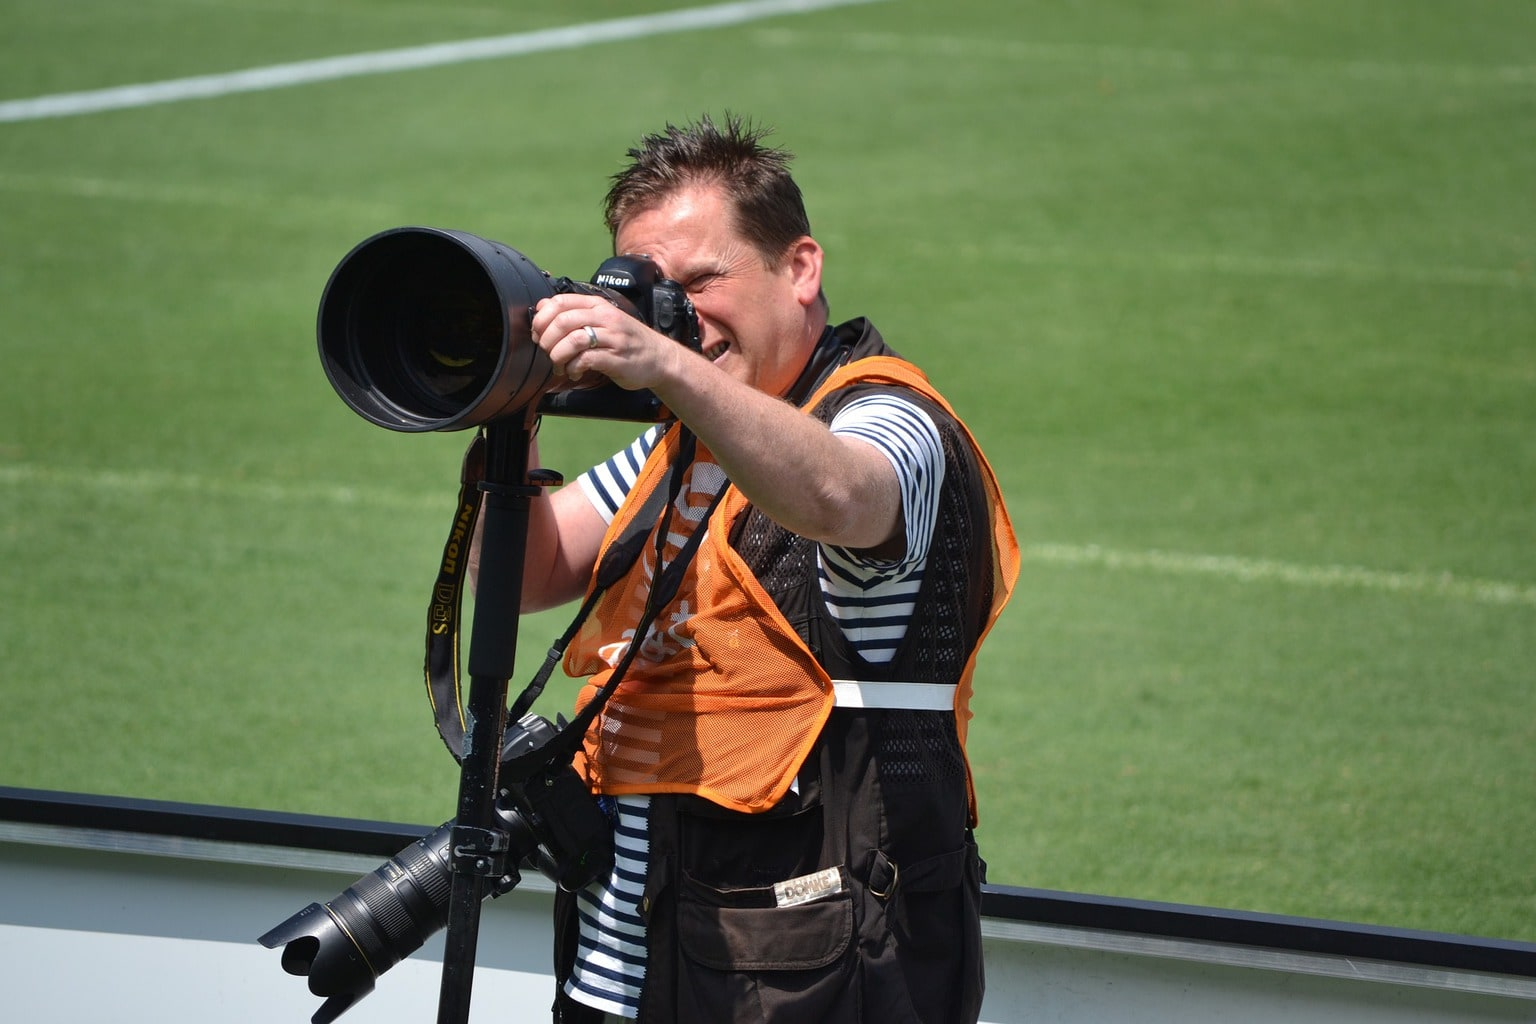 fotógrafo con objetivo zoom